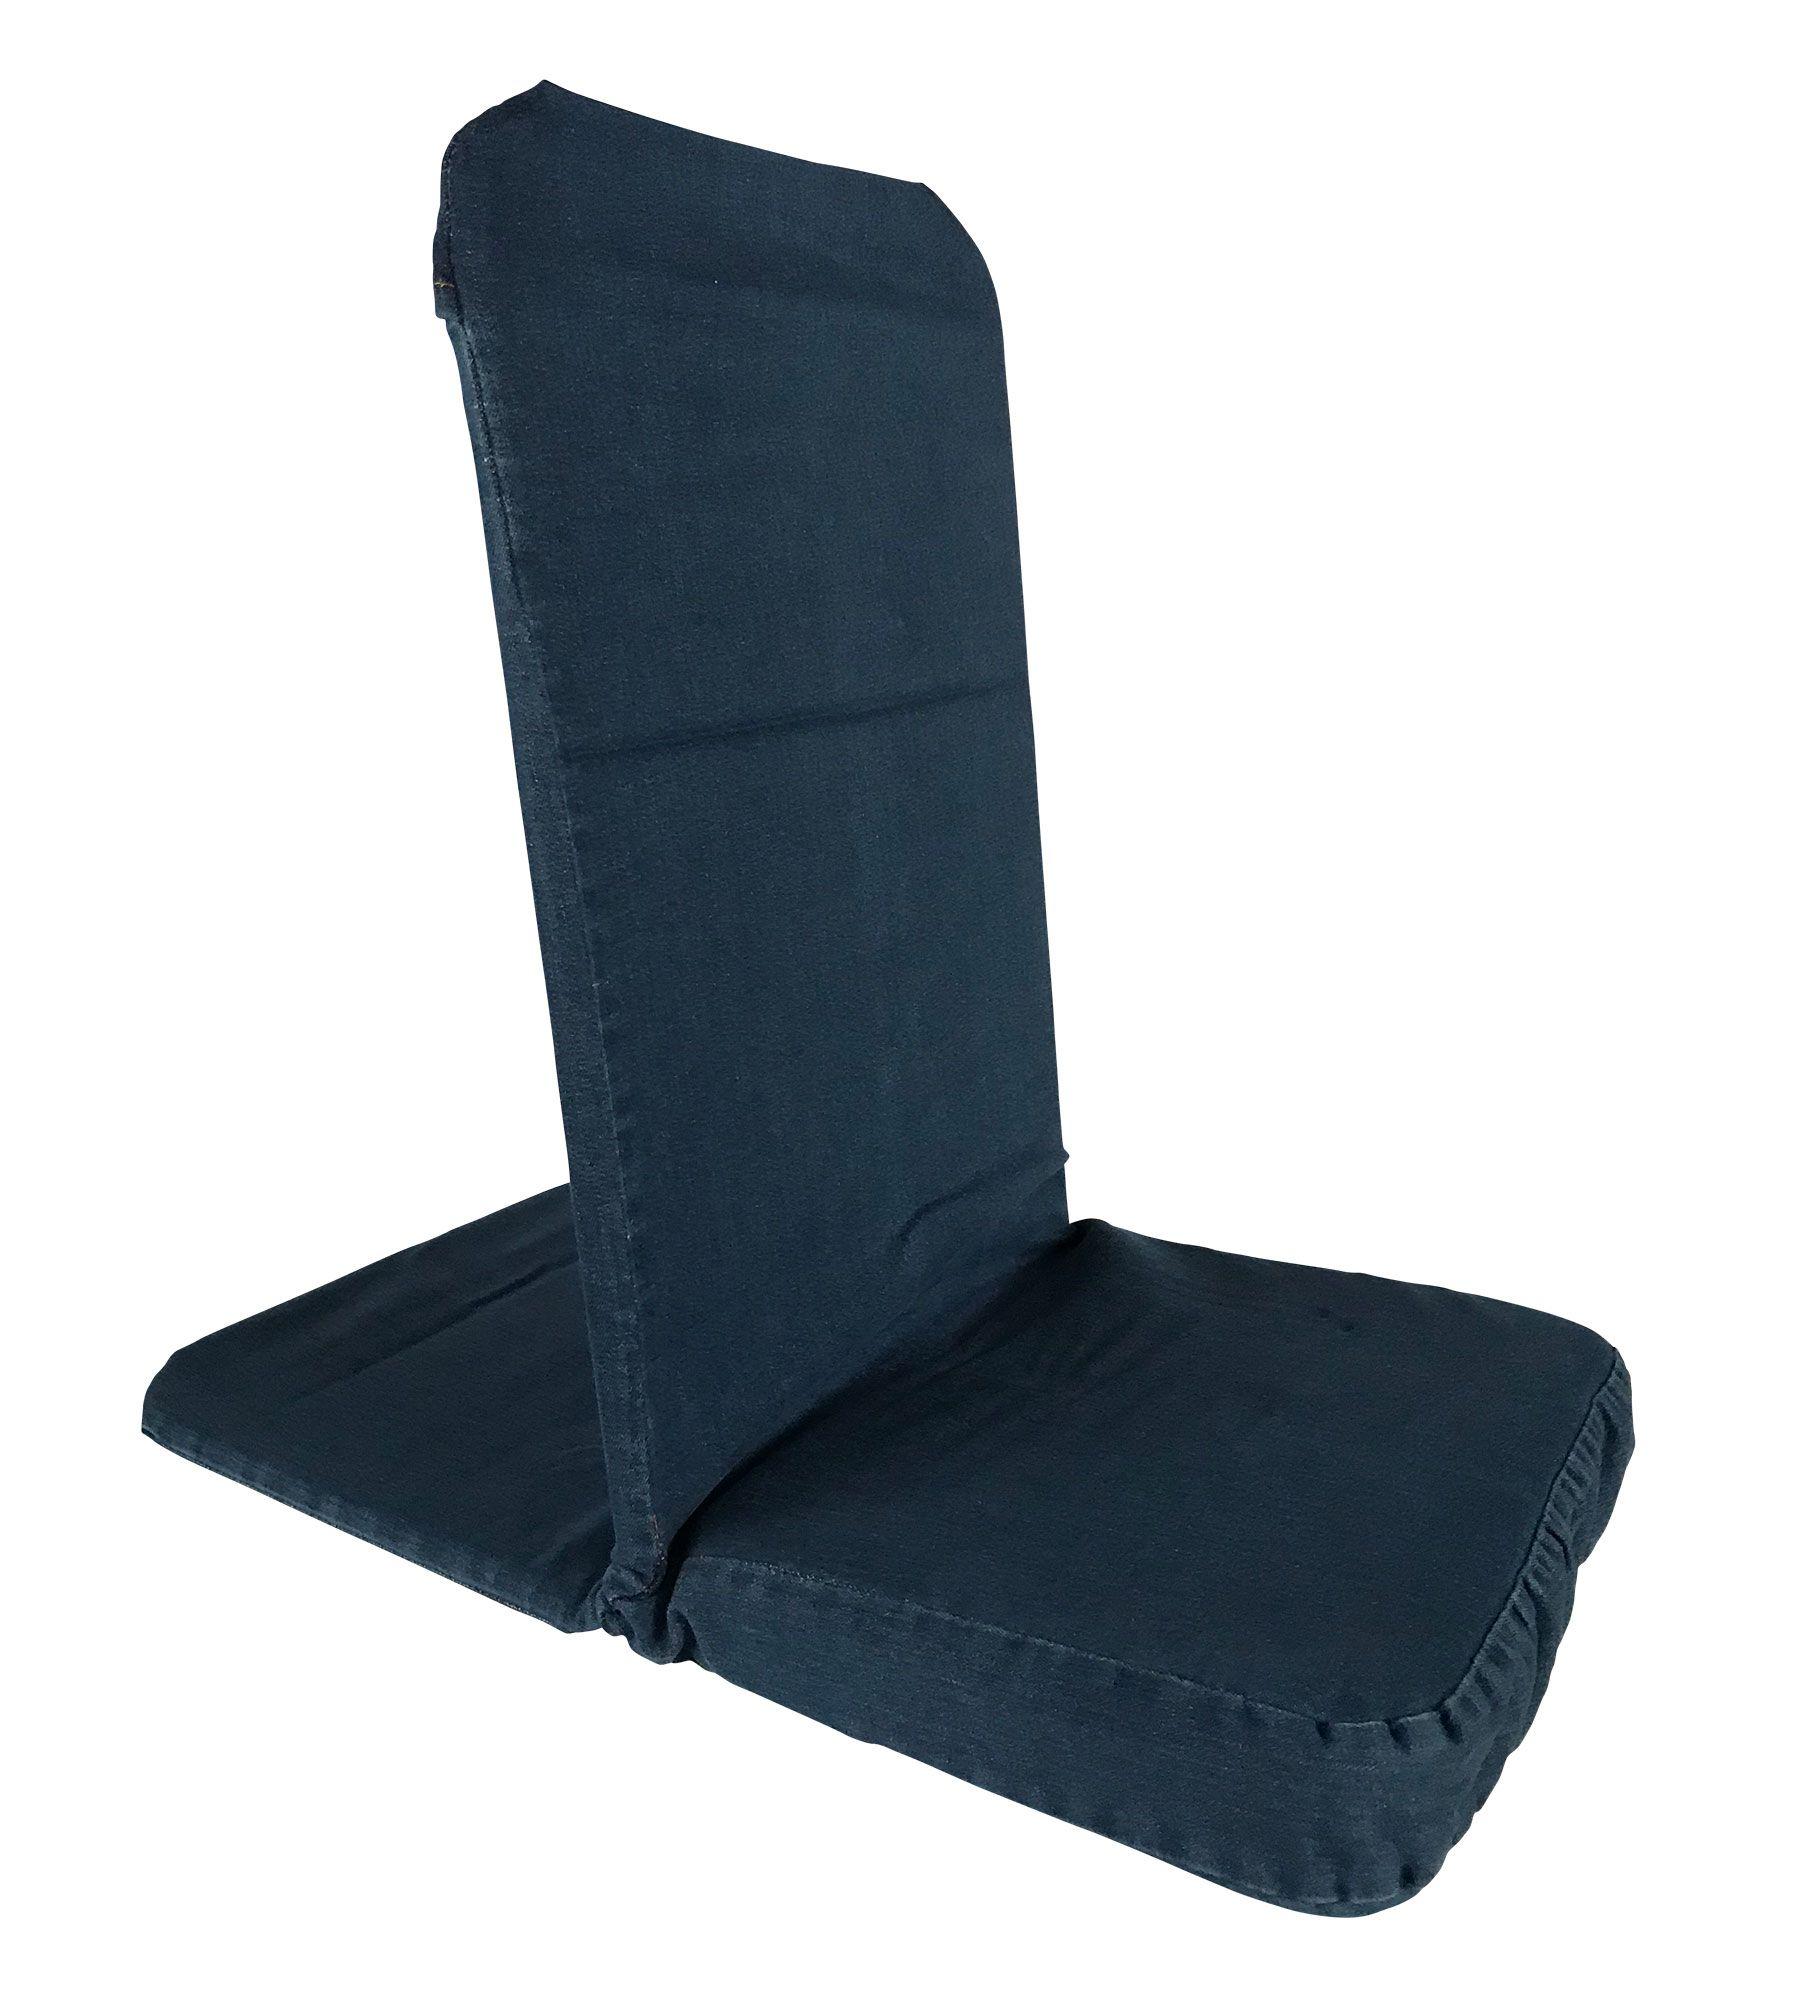 Backjack regular floor chair in light denim floor chair